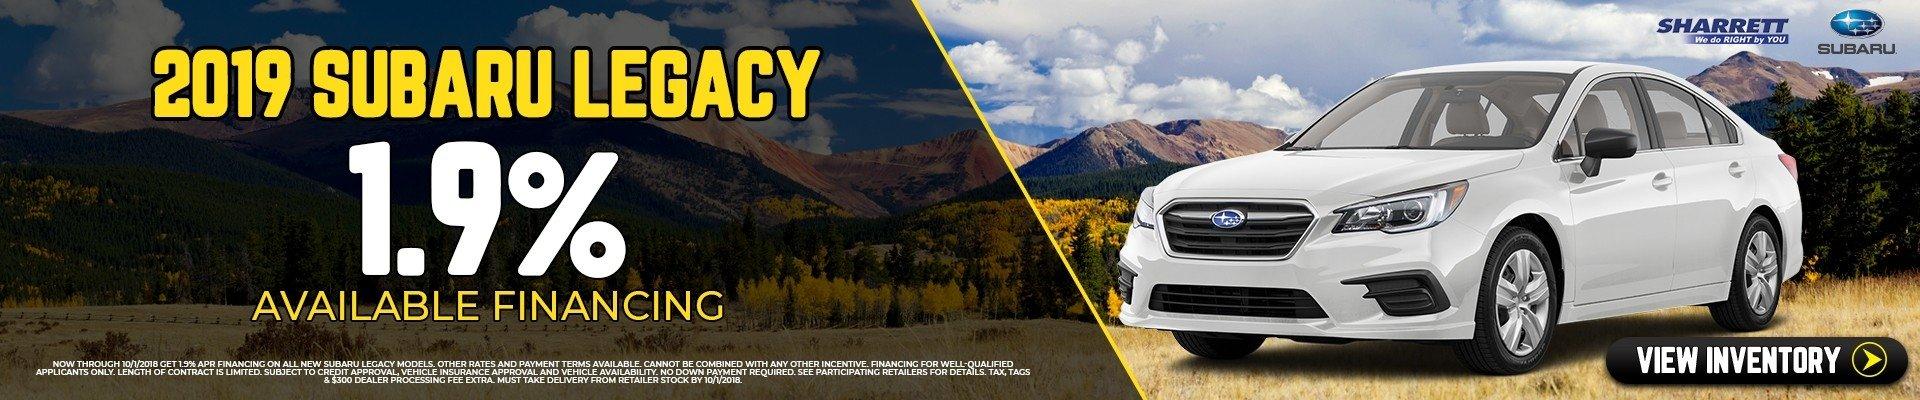 Get 1.9% financing on new 2019 Subaru Legacy | Sharrett Subaru